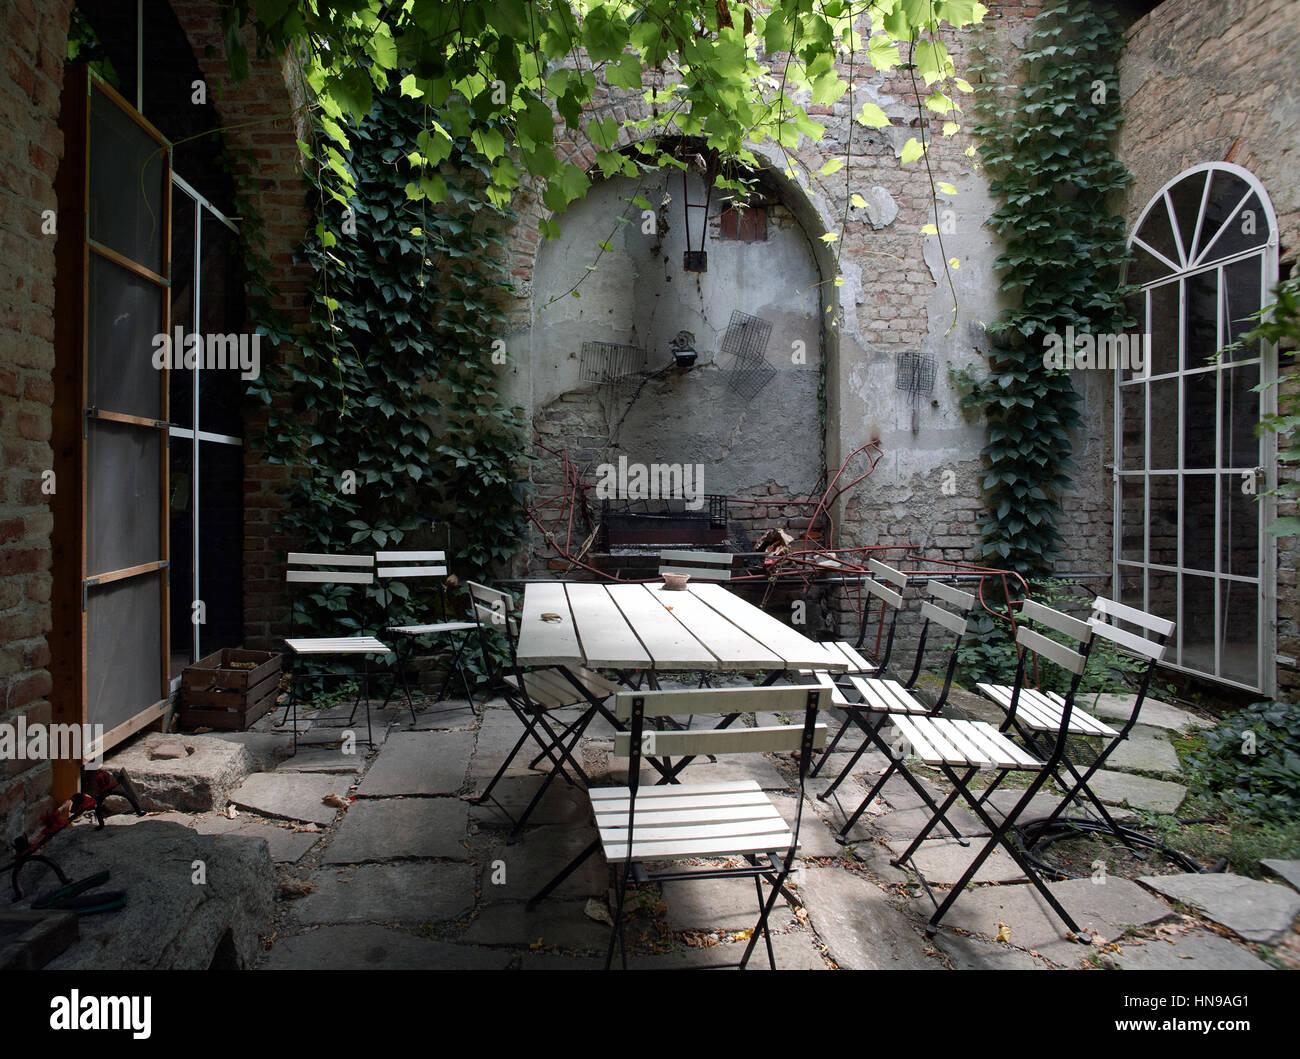 Interior garden close to the kitchen - Stock Image